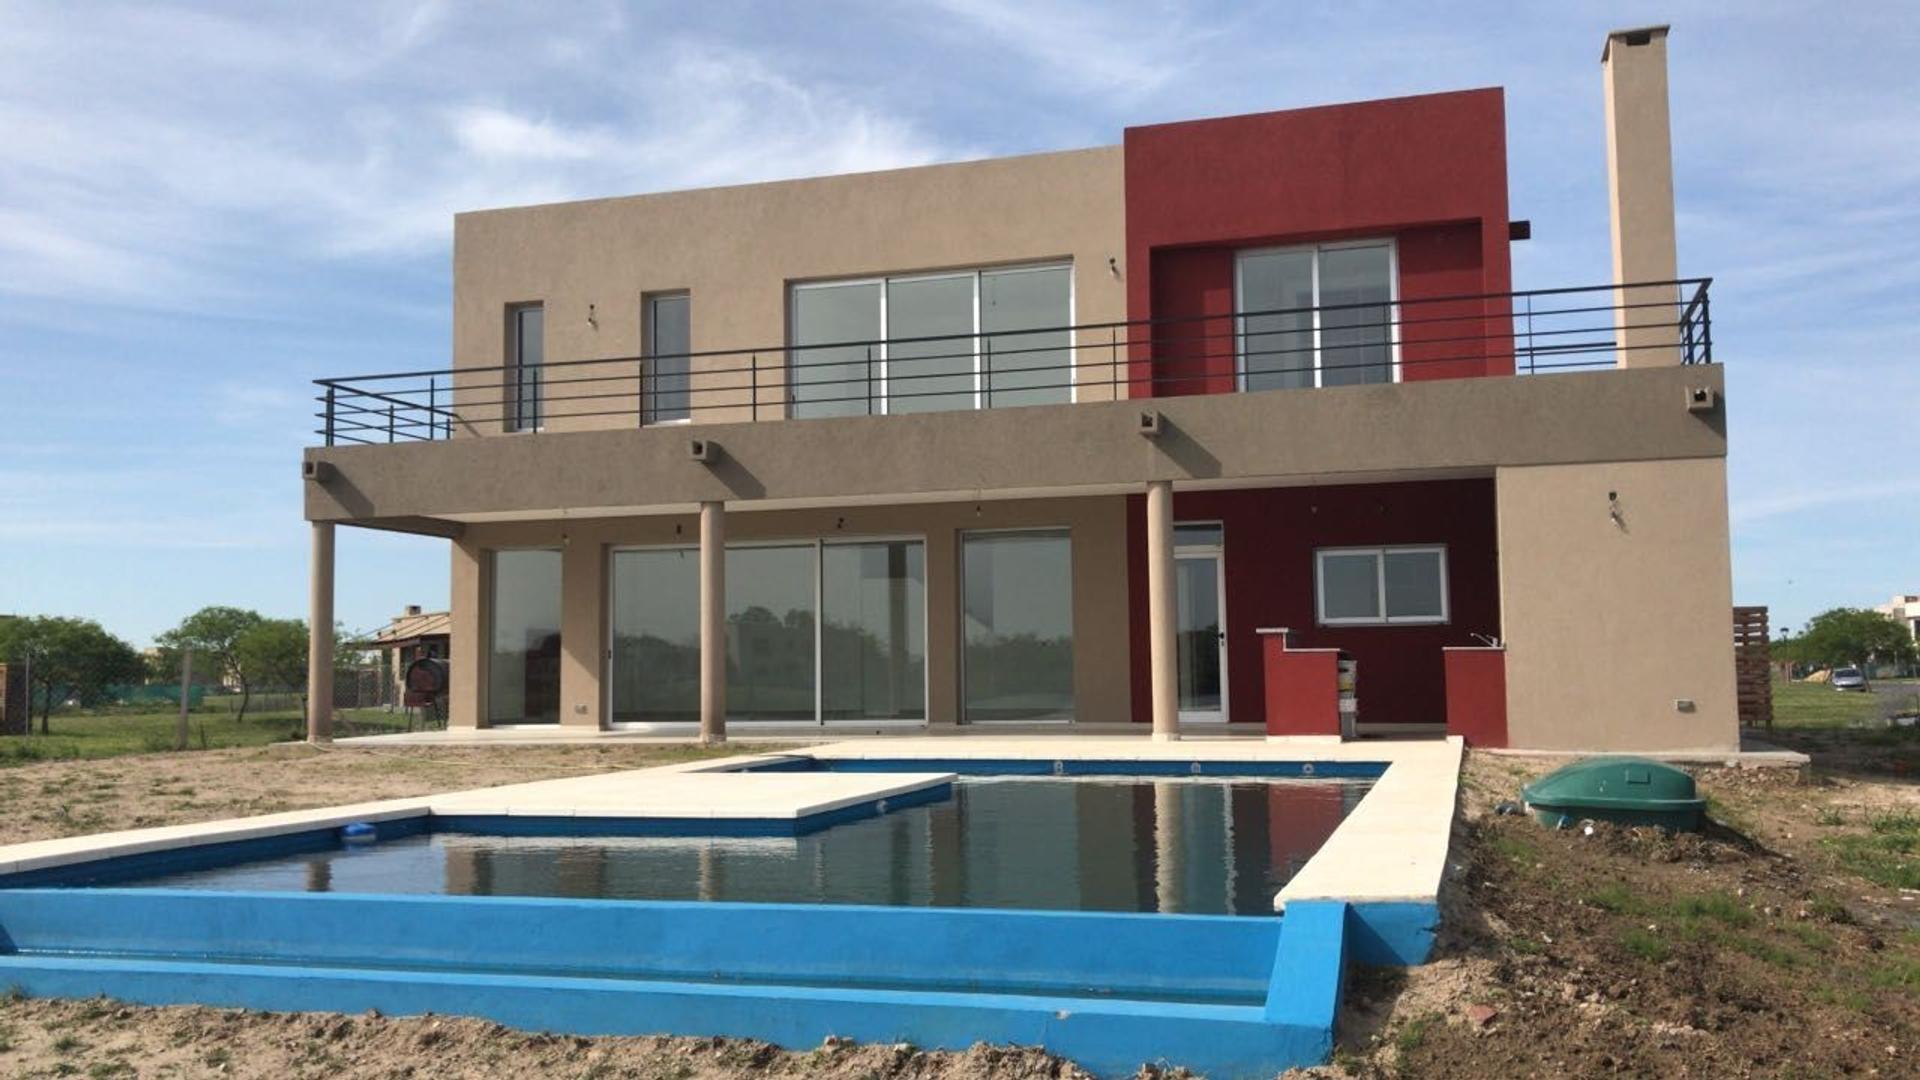 Tizado Pilar - Casa en venta BC El Cantón, Escobar - PIL3685_LP124053_1